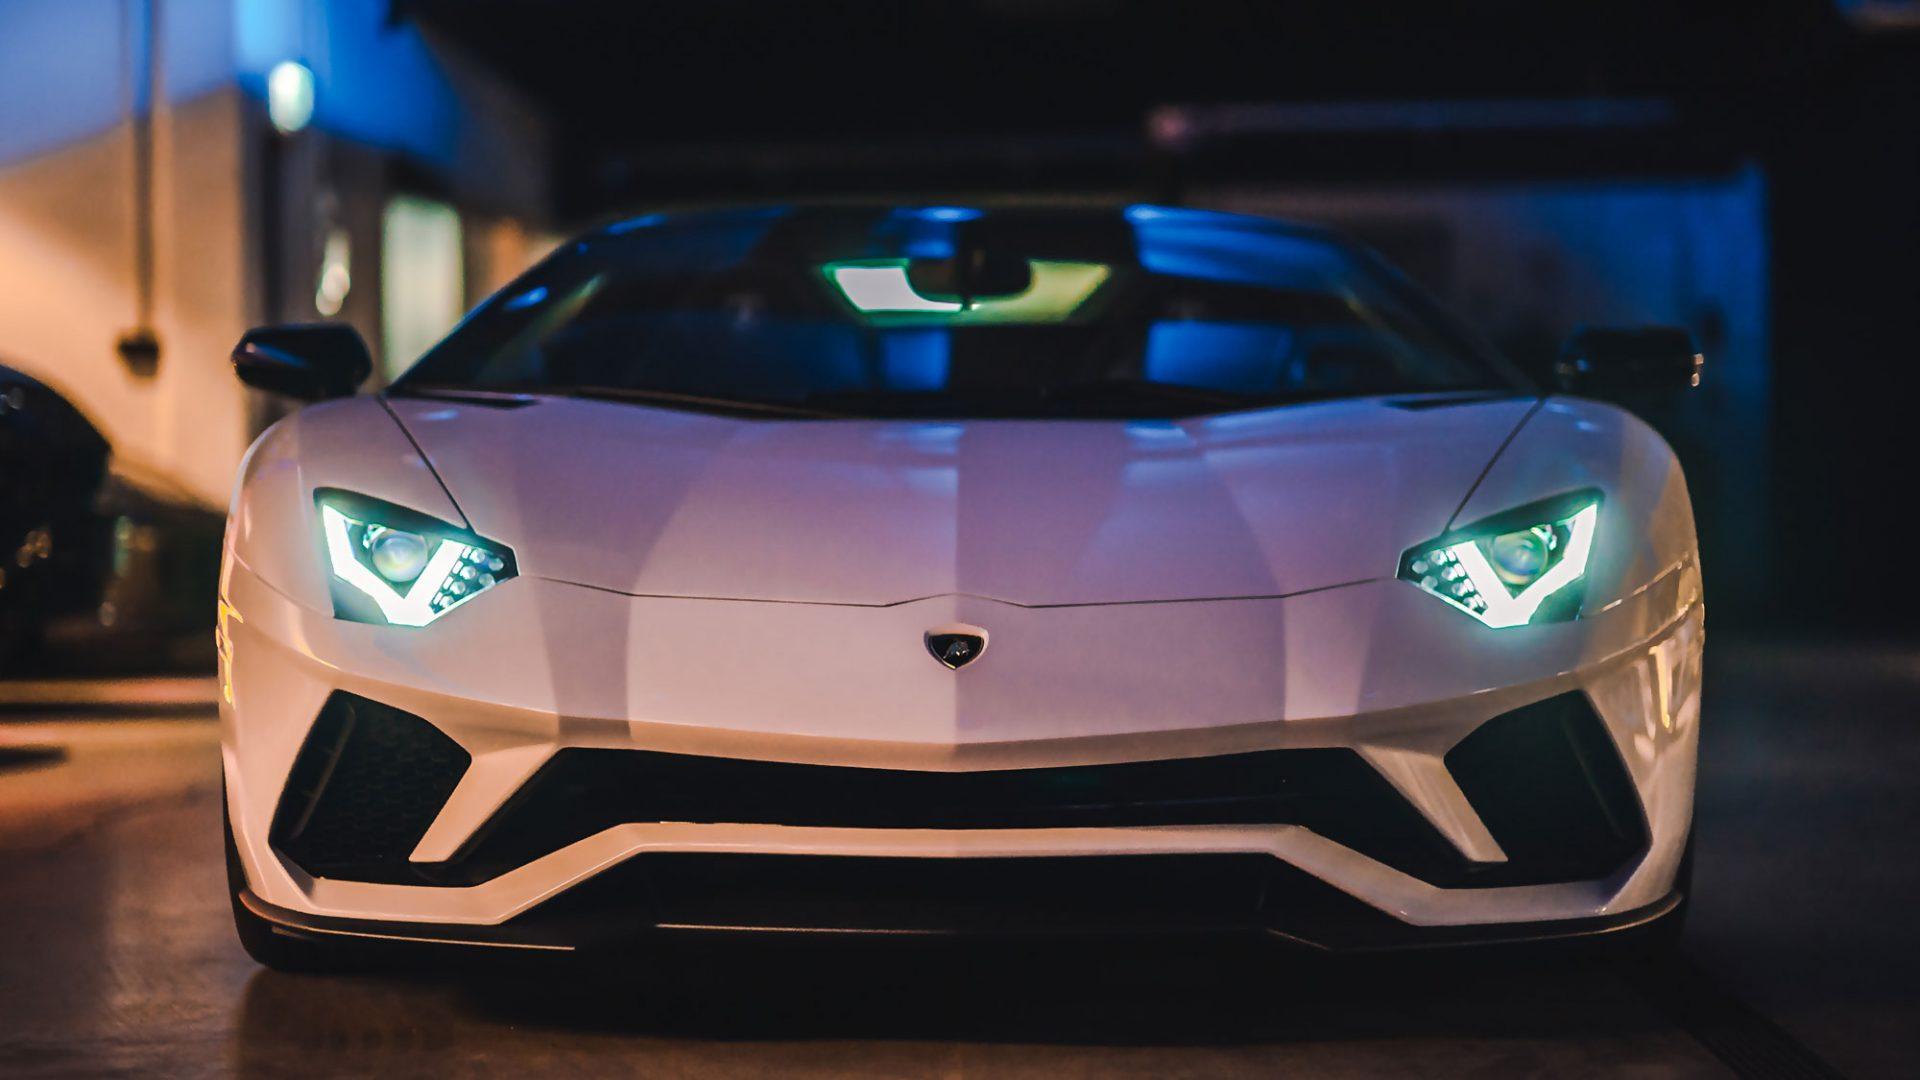 Weißer Lamborghini bei Nacht